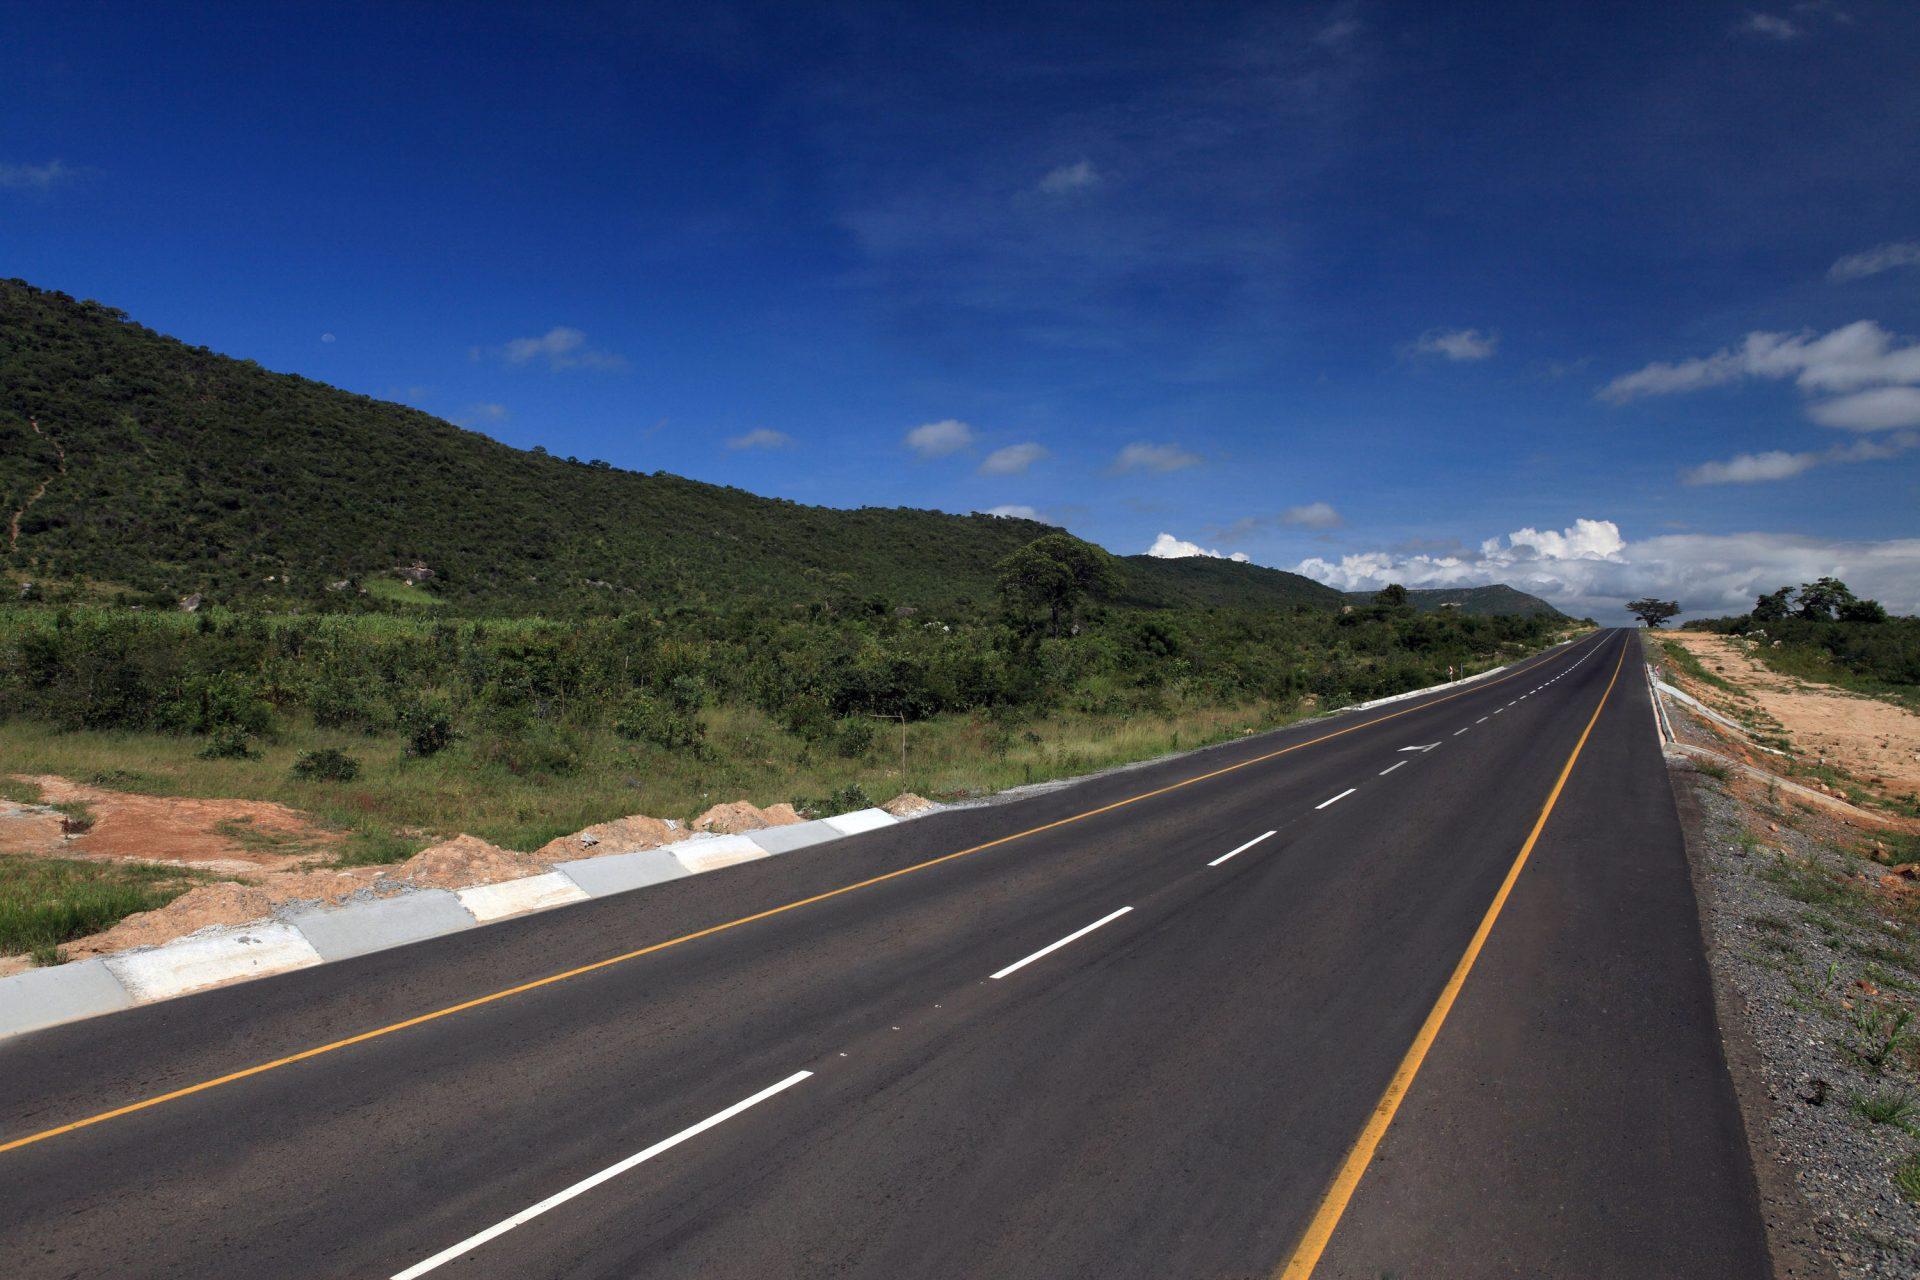 Estrada Ondjiva / Lubango -Troço